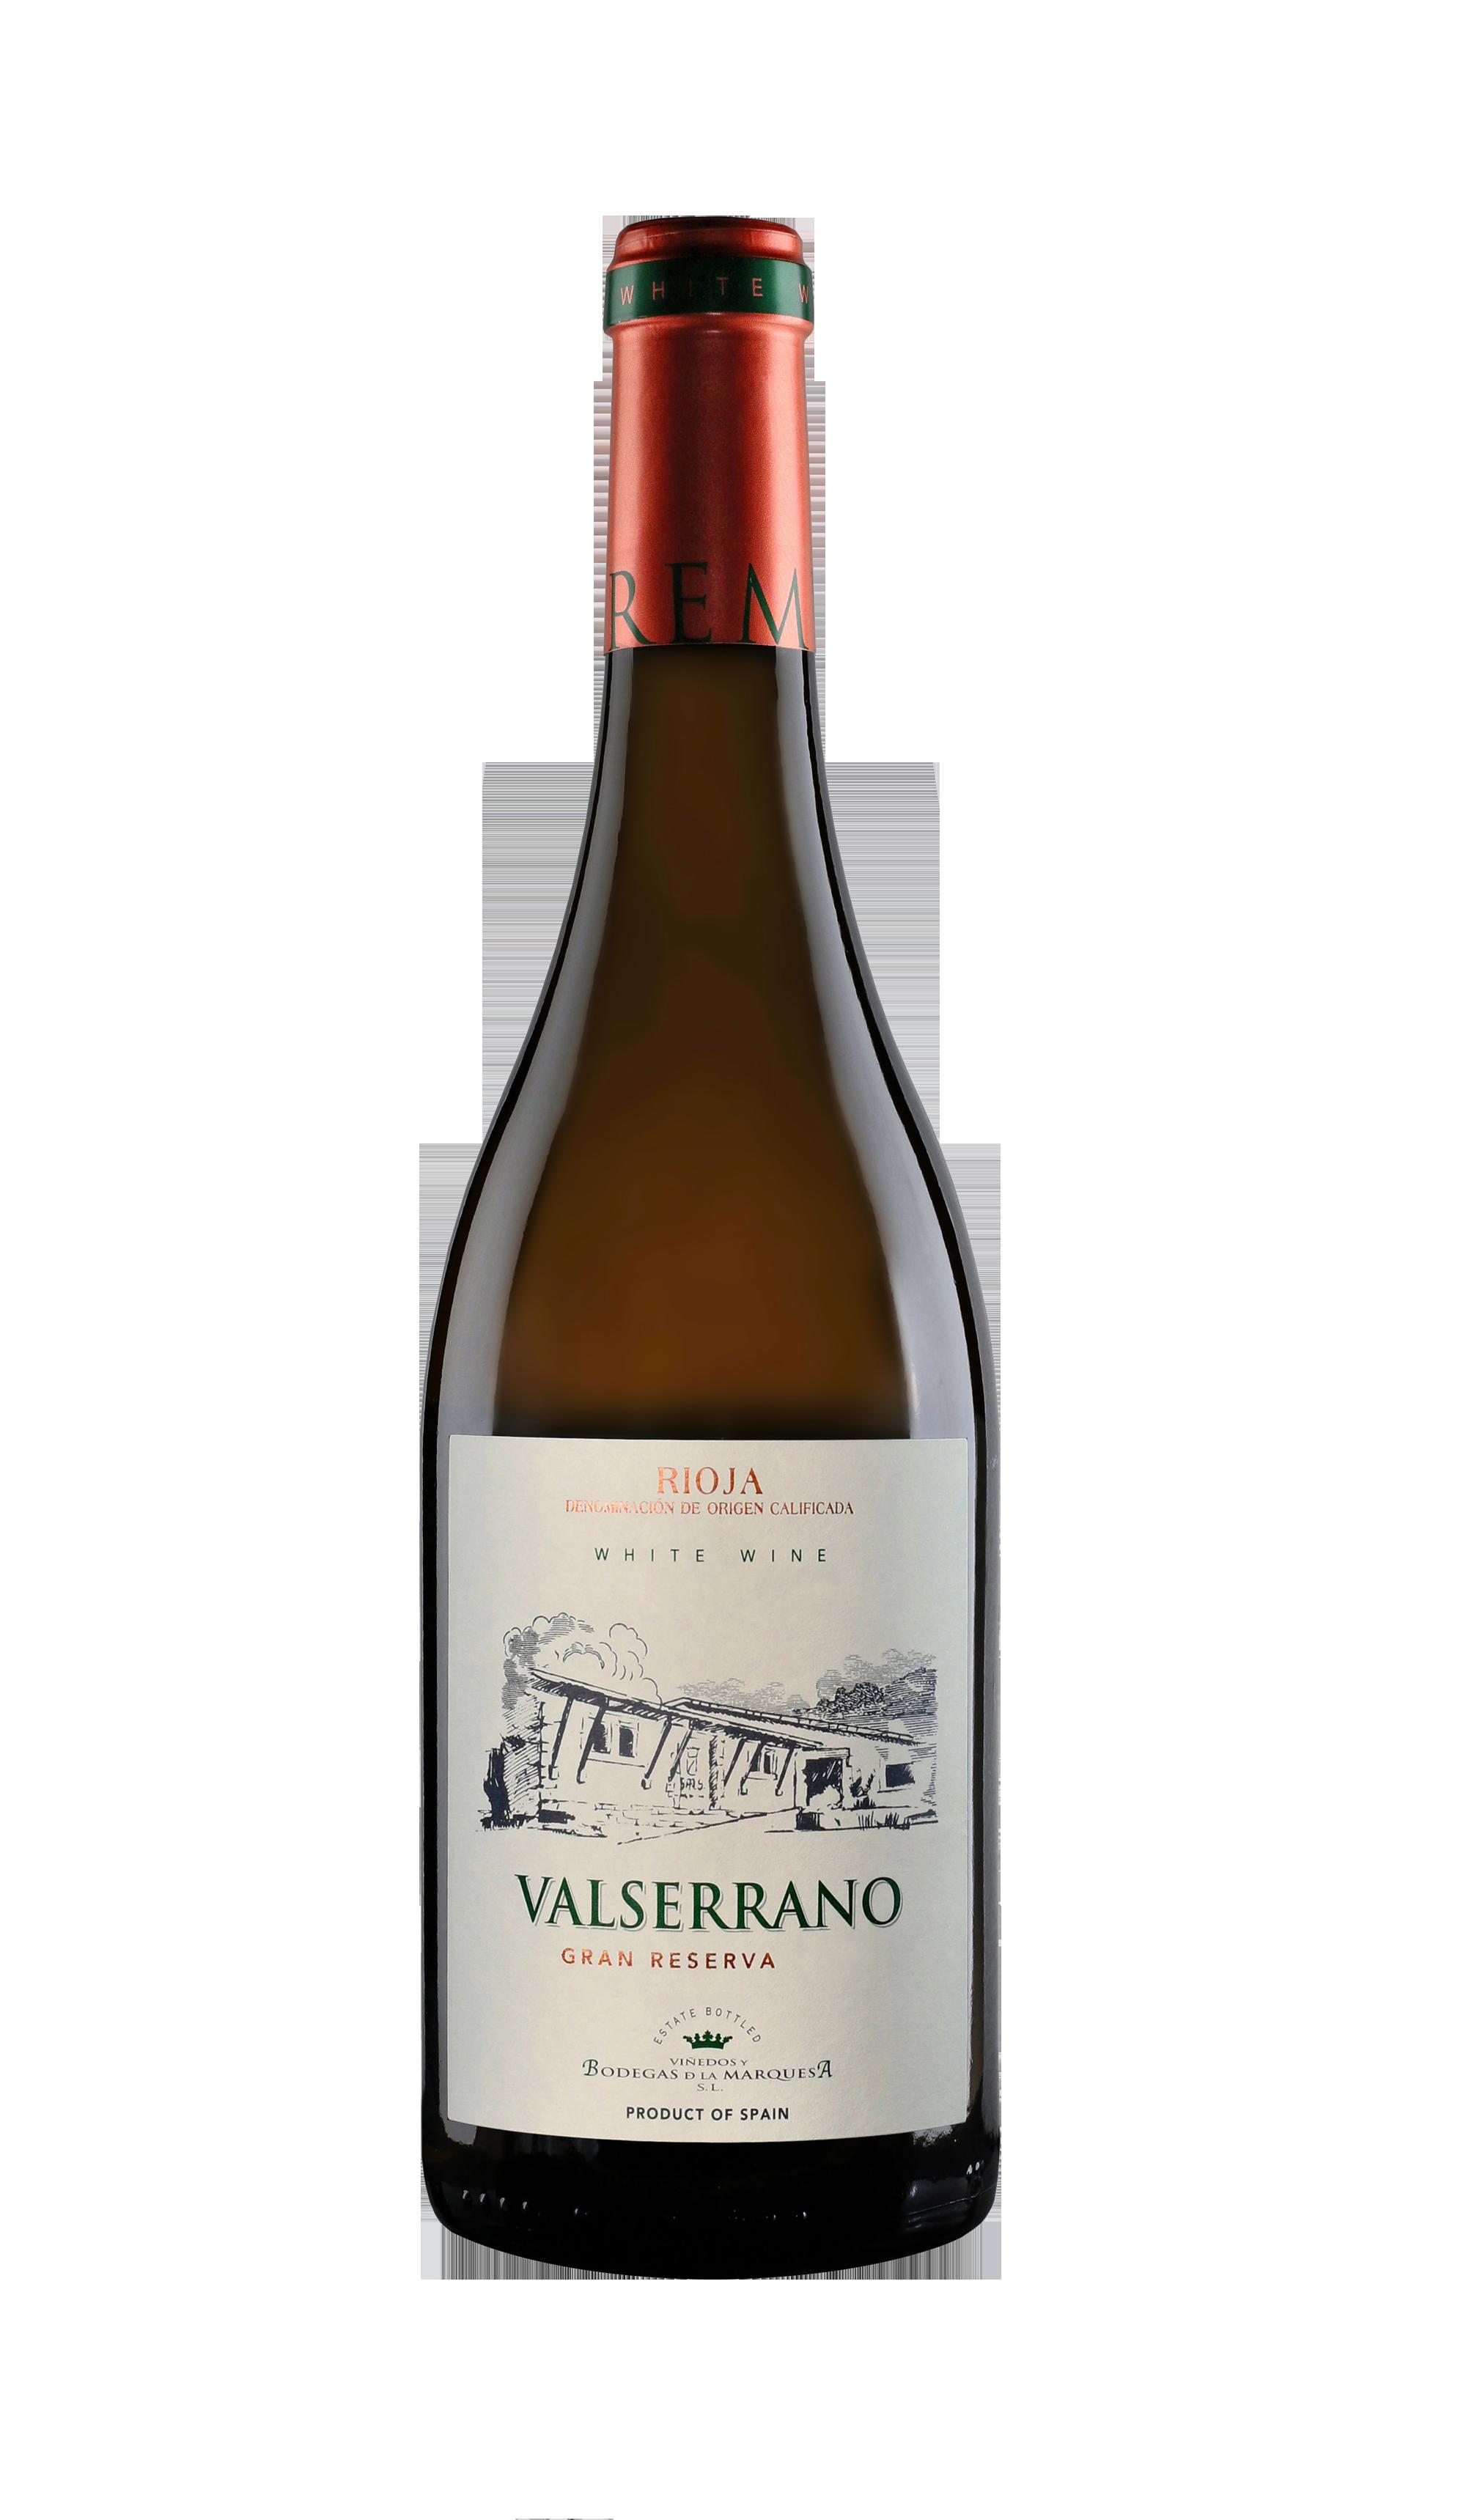 Valserrano Blanco Gran Reserva 2013